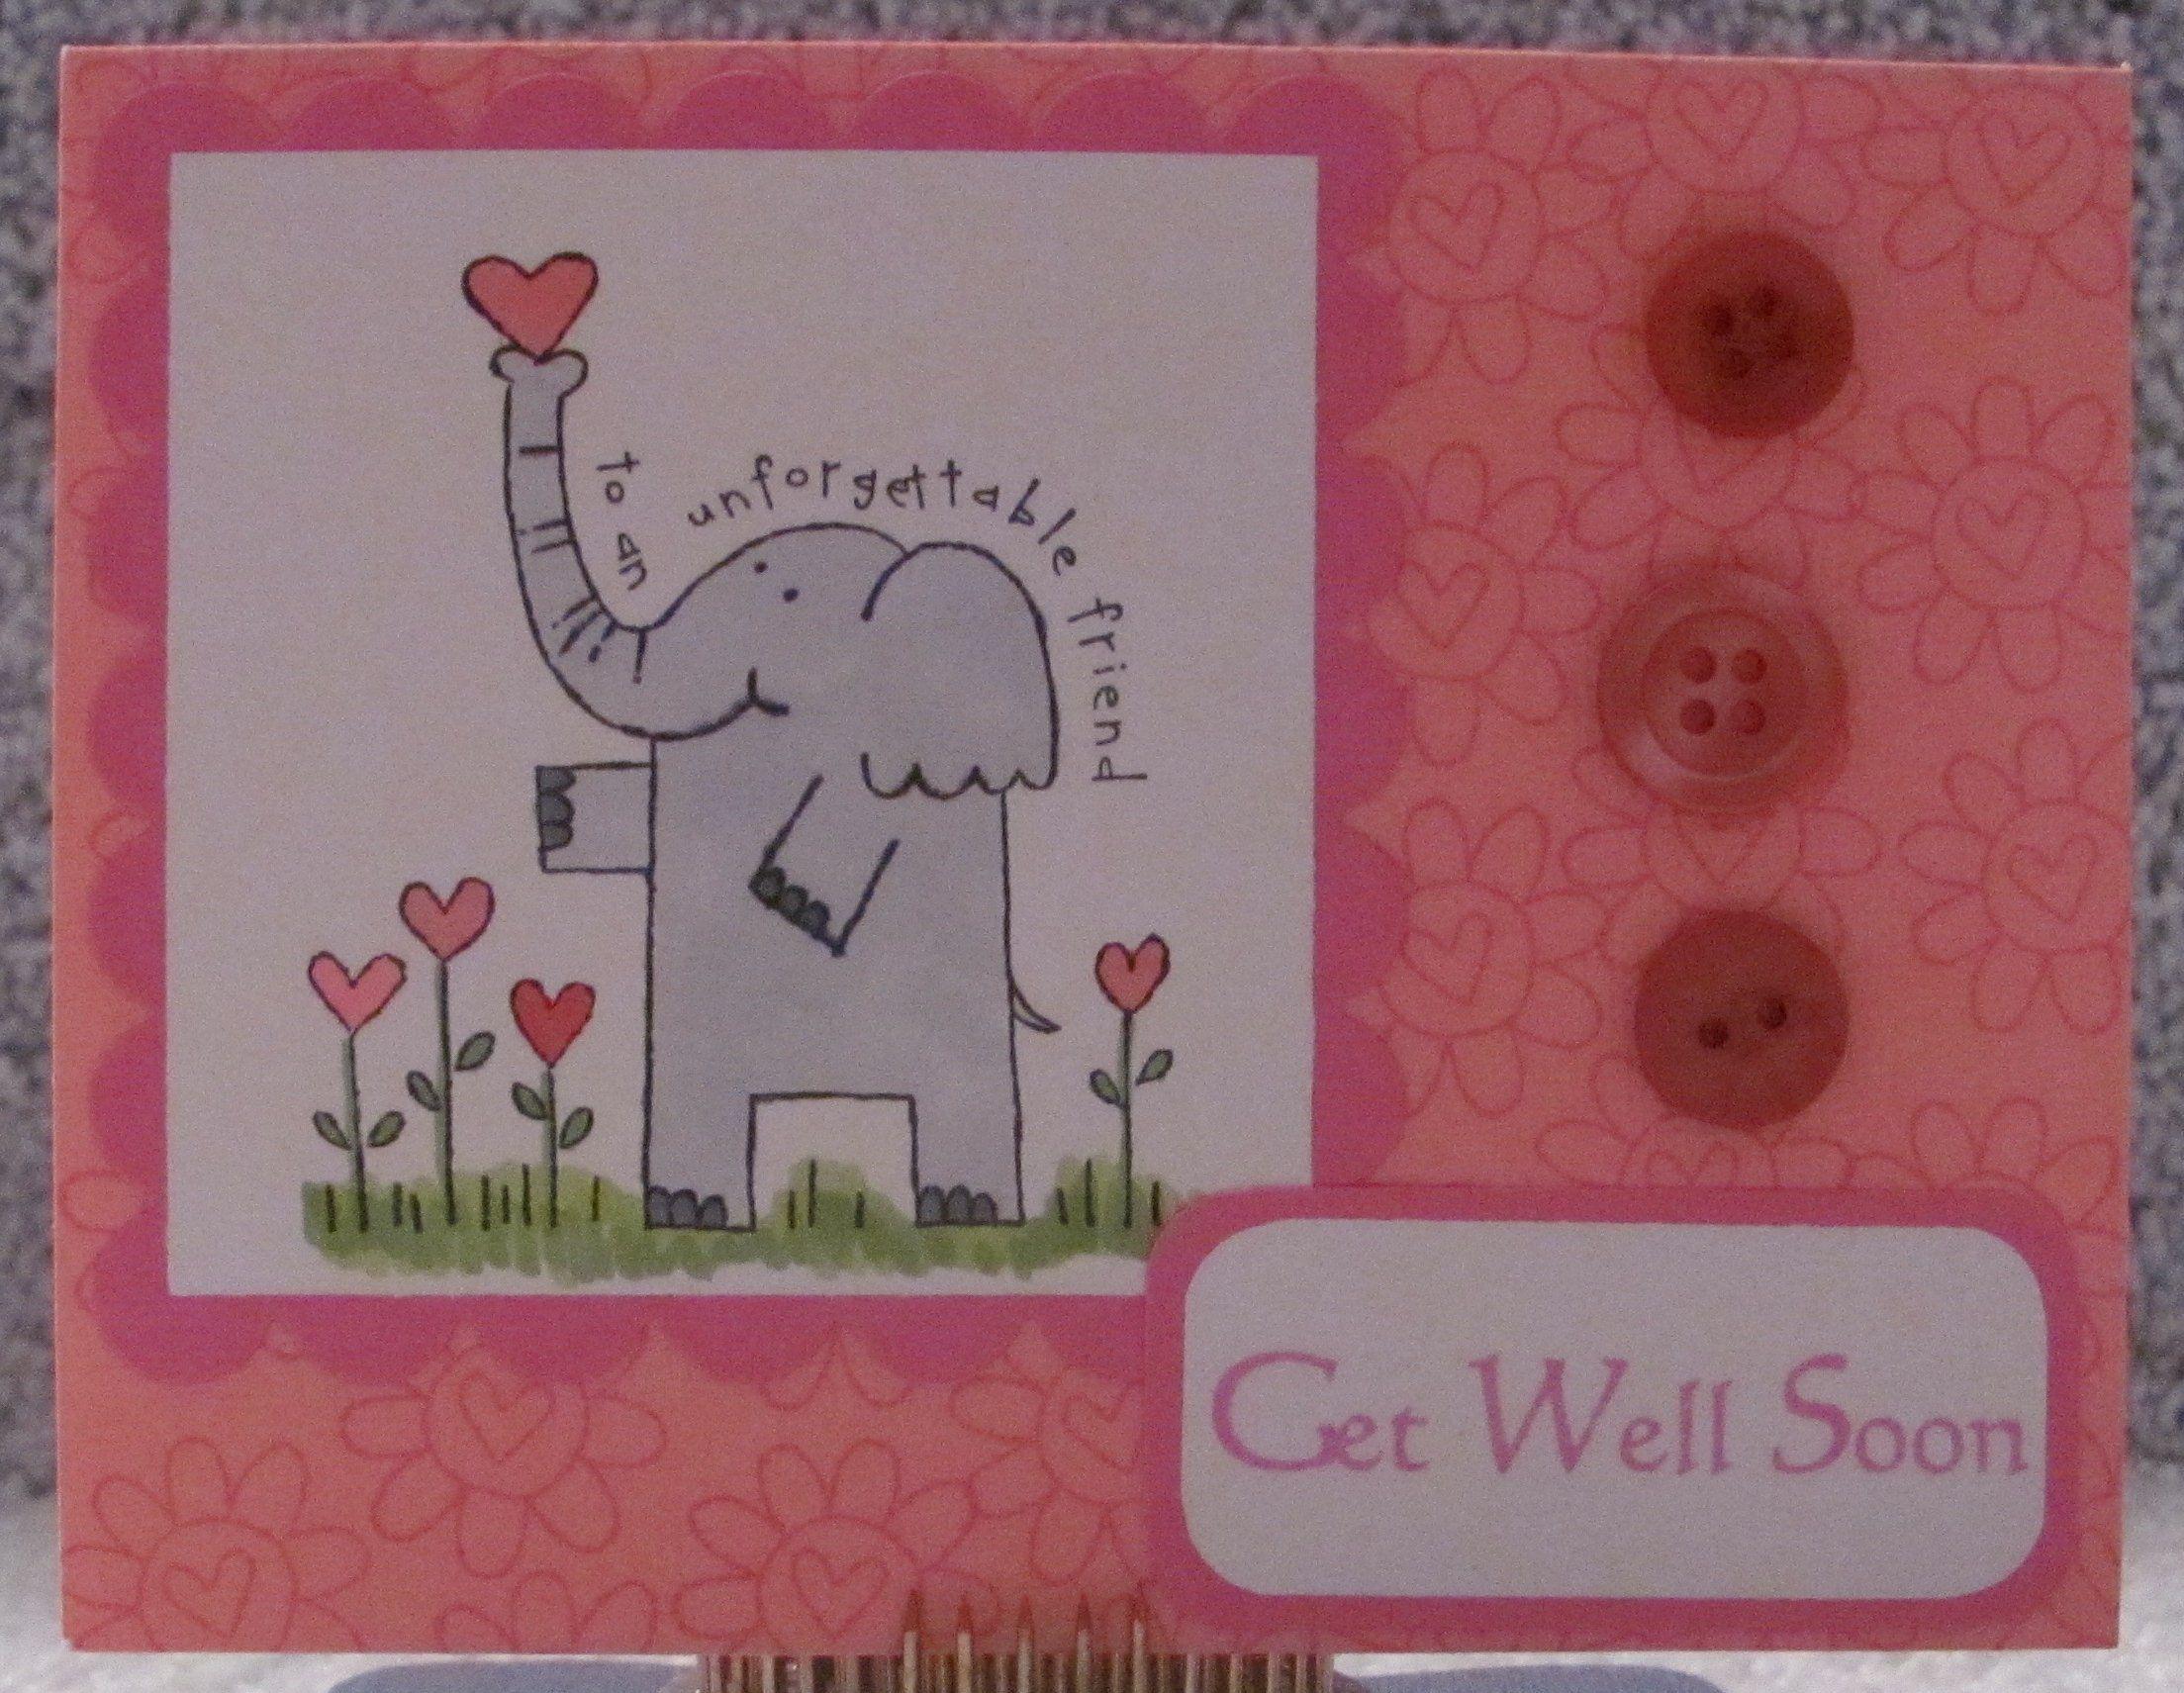 Pinterest get well card ideas get well soon adorable elephant a2 pinterest get well card ideas get well soon adorable elephant a2 greeting card kids kristyandbryce Images